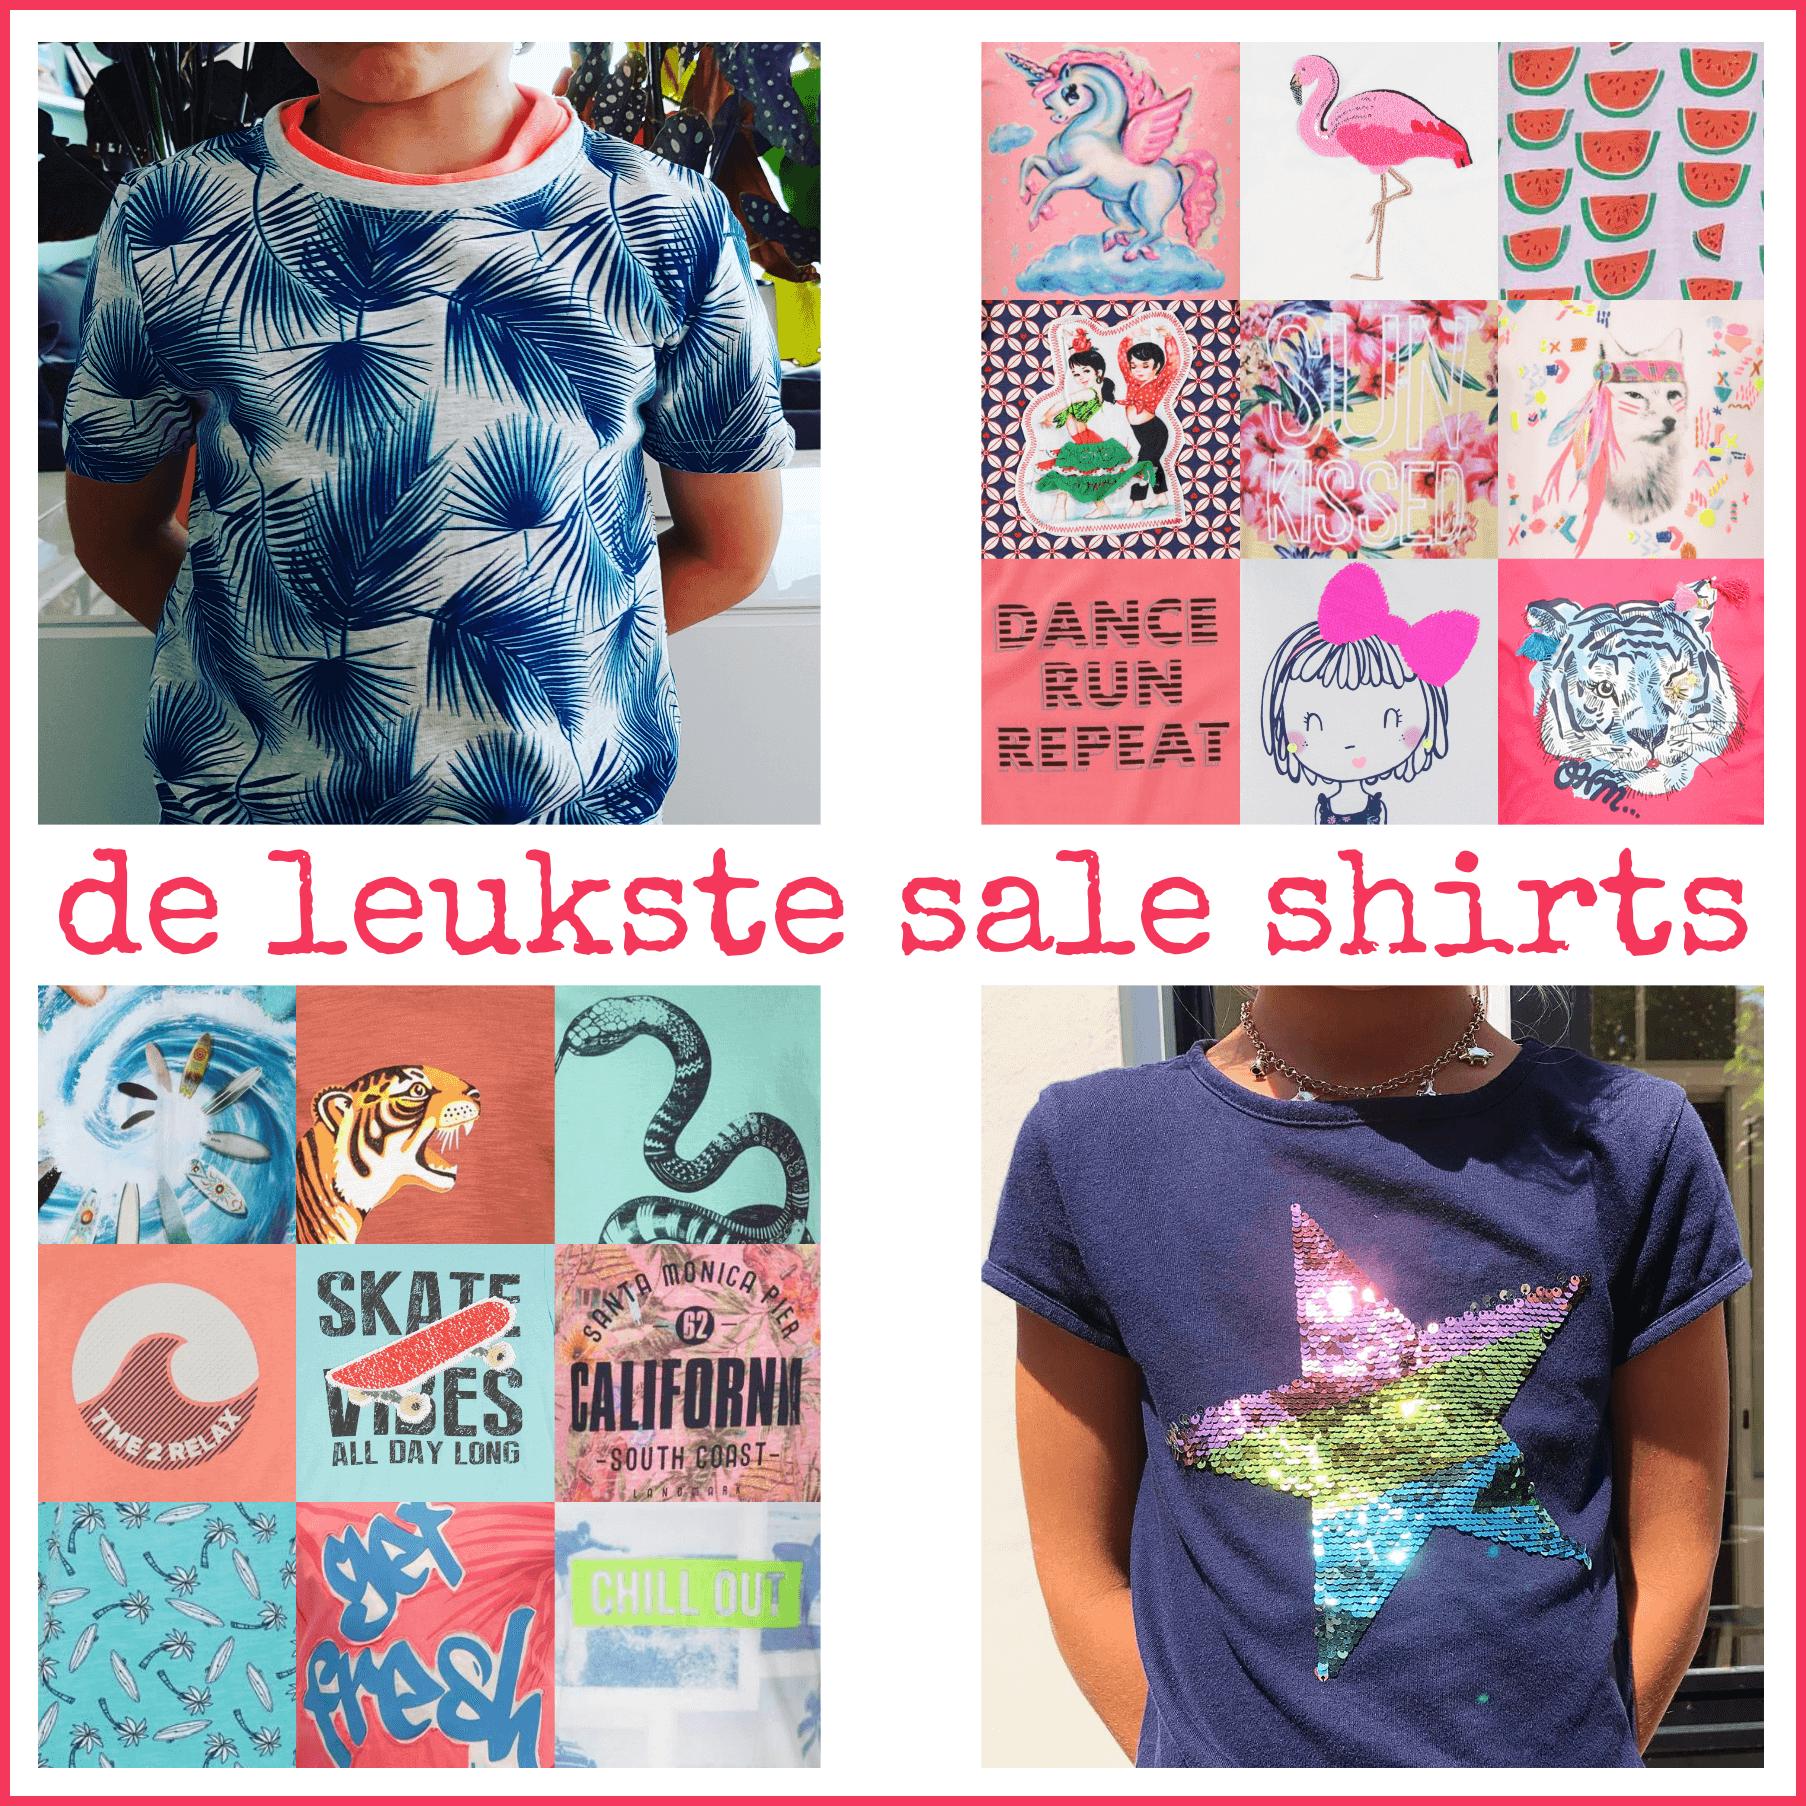 uitverkoop: de leukste sale shirts voor jongens en meisjes #leukmetkids #kinderkleding #meisjeskleding